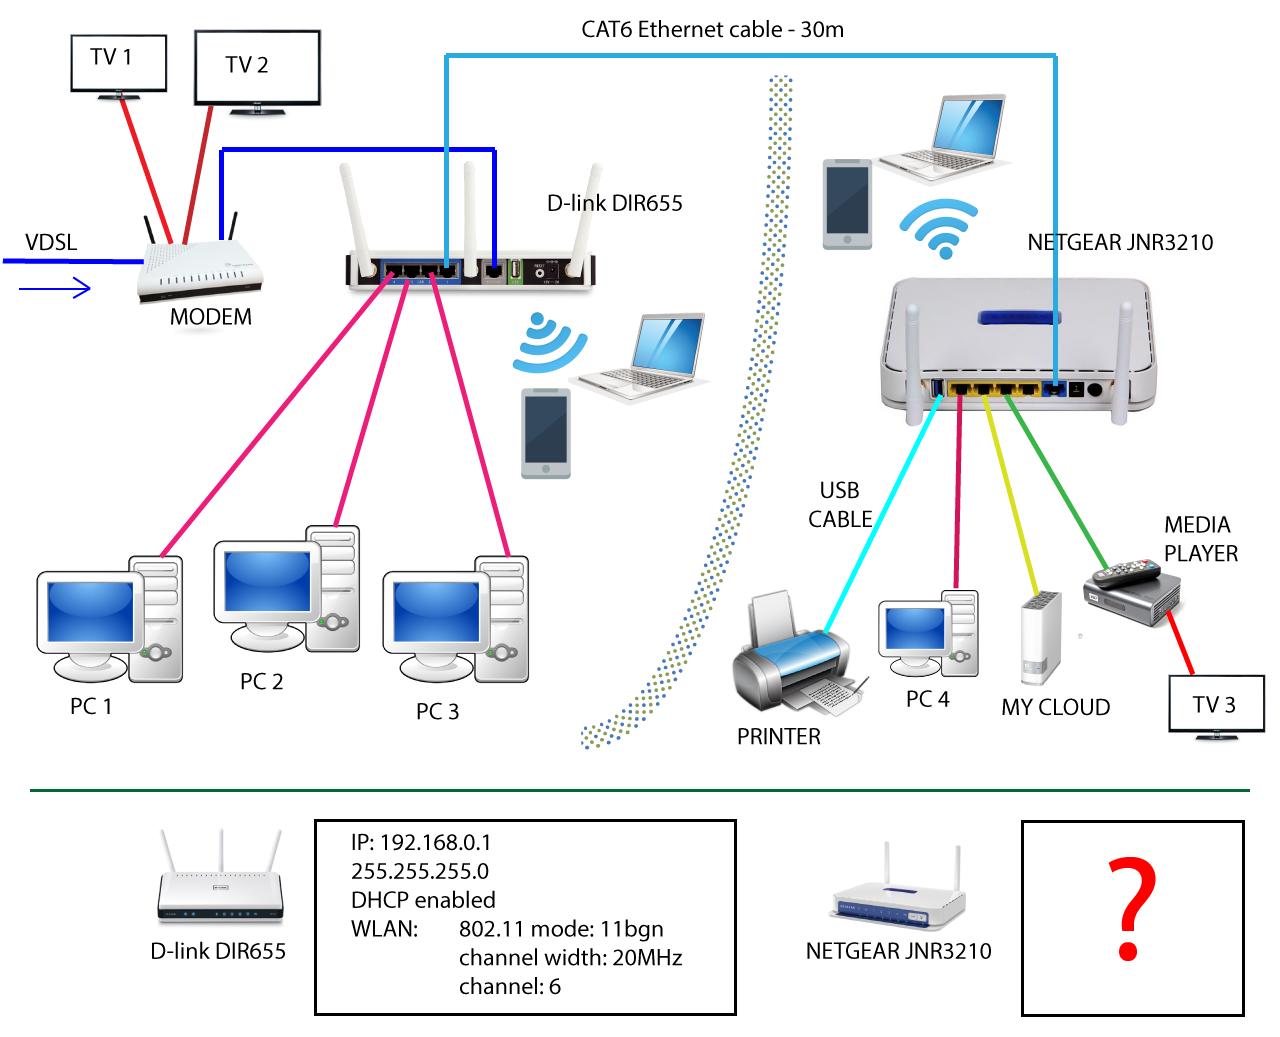 solved two routers on one network netgear setup netgear communities Chromecast Wiring Diagram network setup png Safety Vision Wiring Diagram